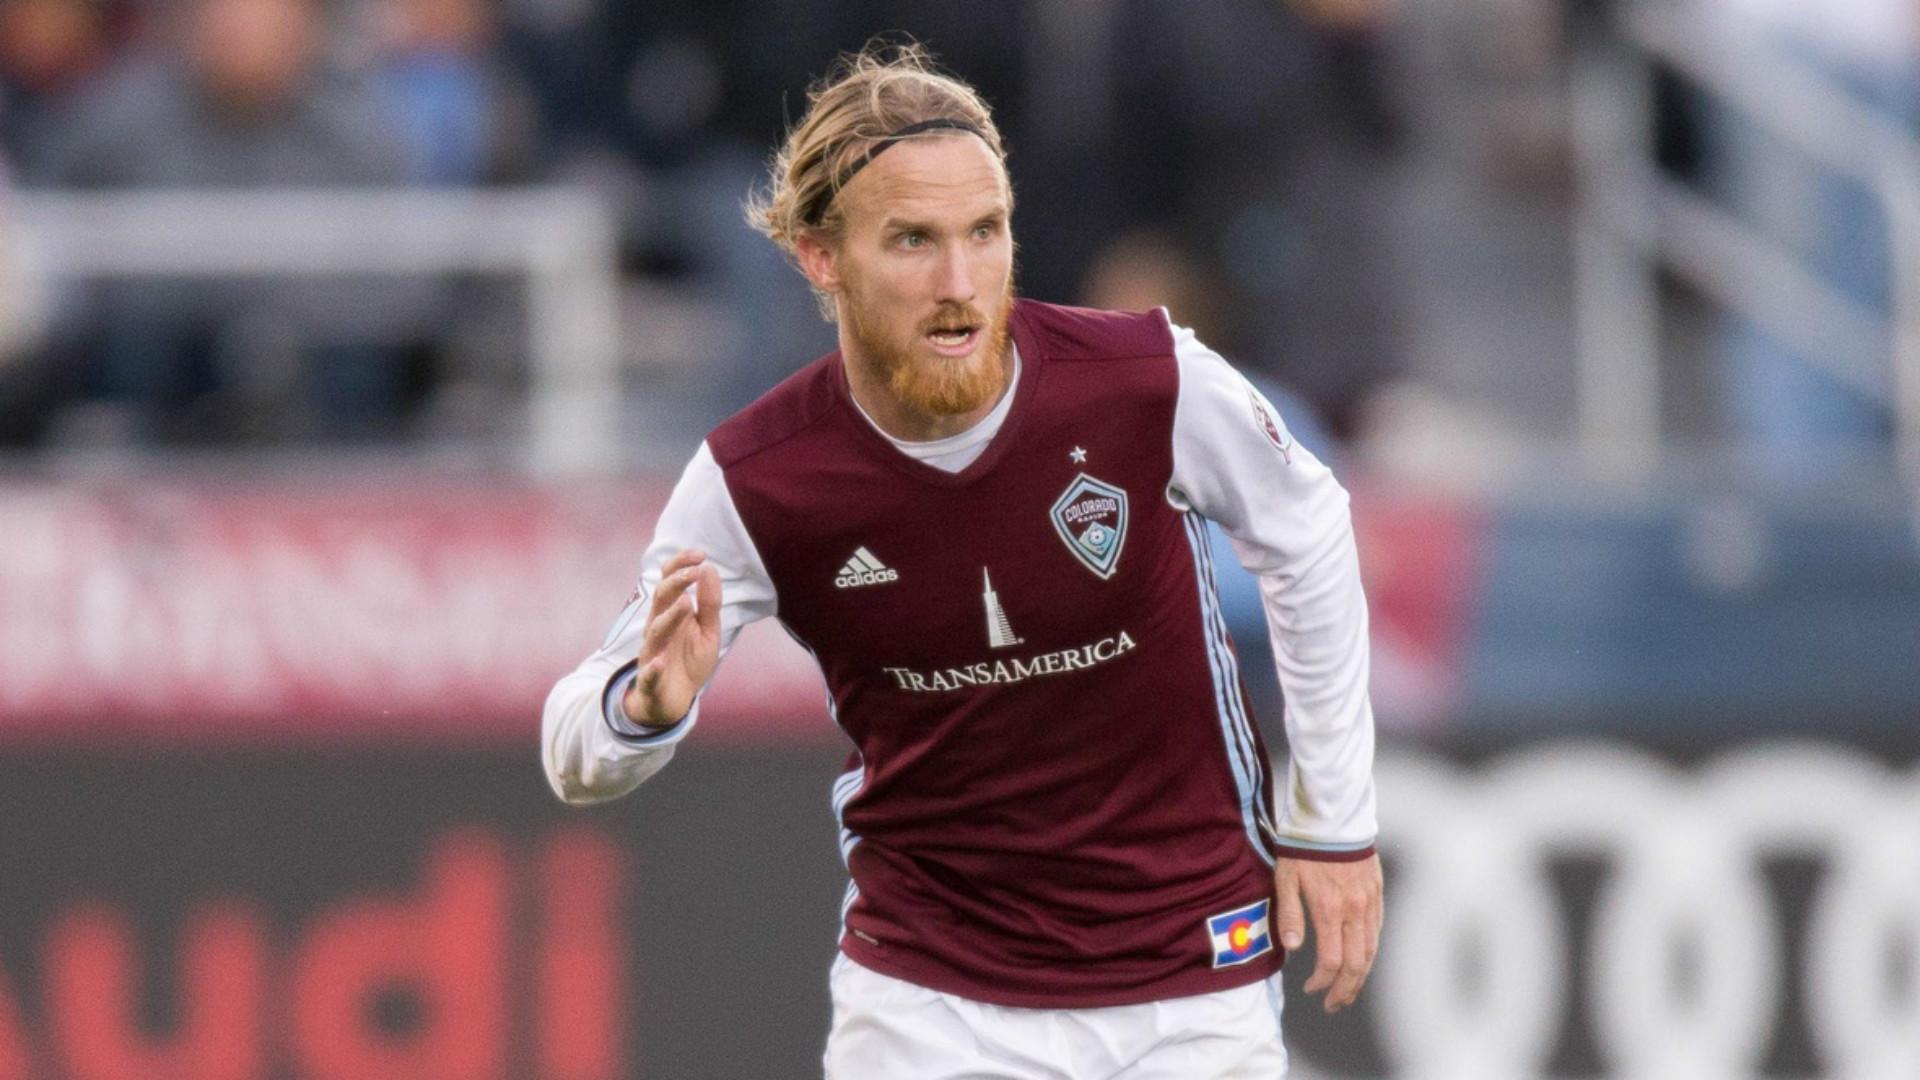 Montreal Impact, Toronto FC lose players to Atlanta in MLS expansion draft